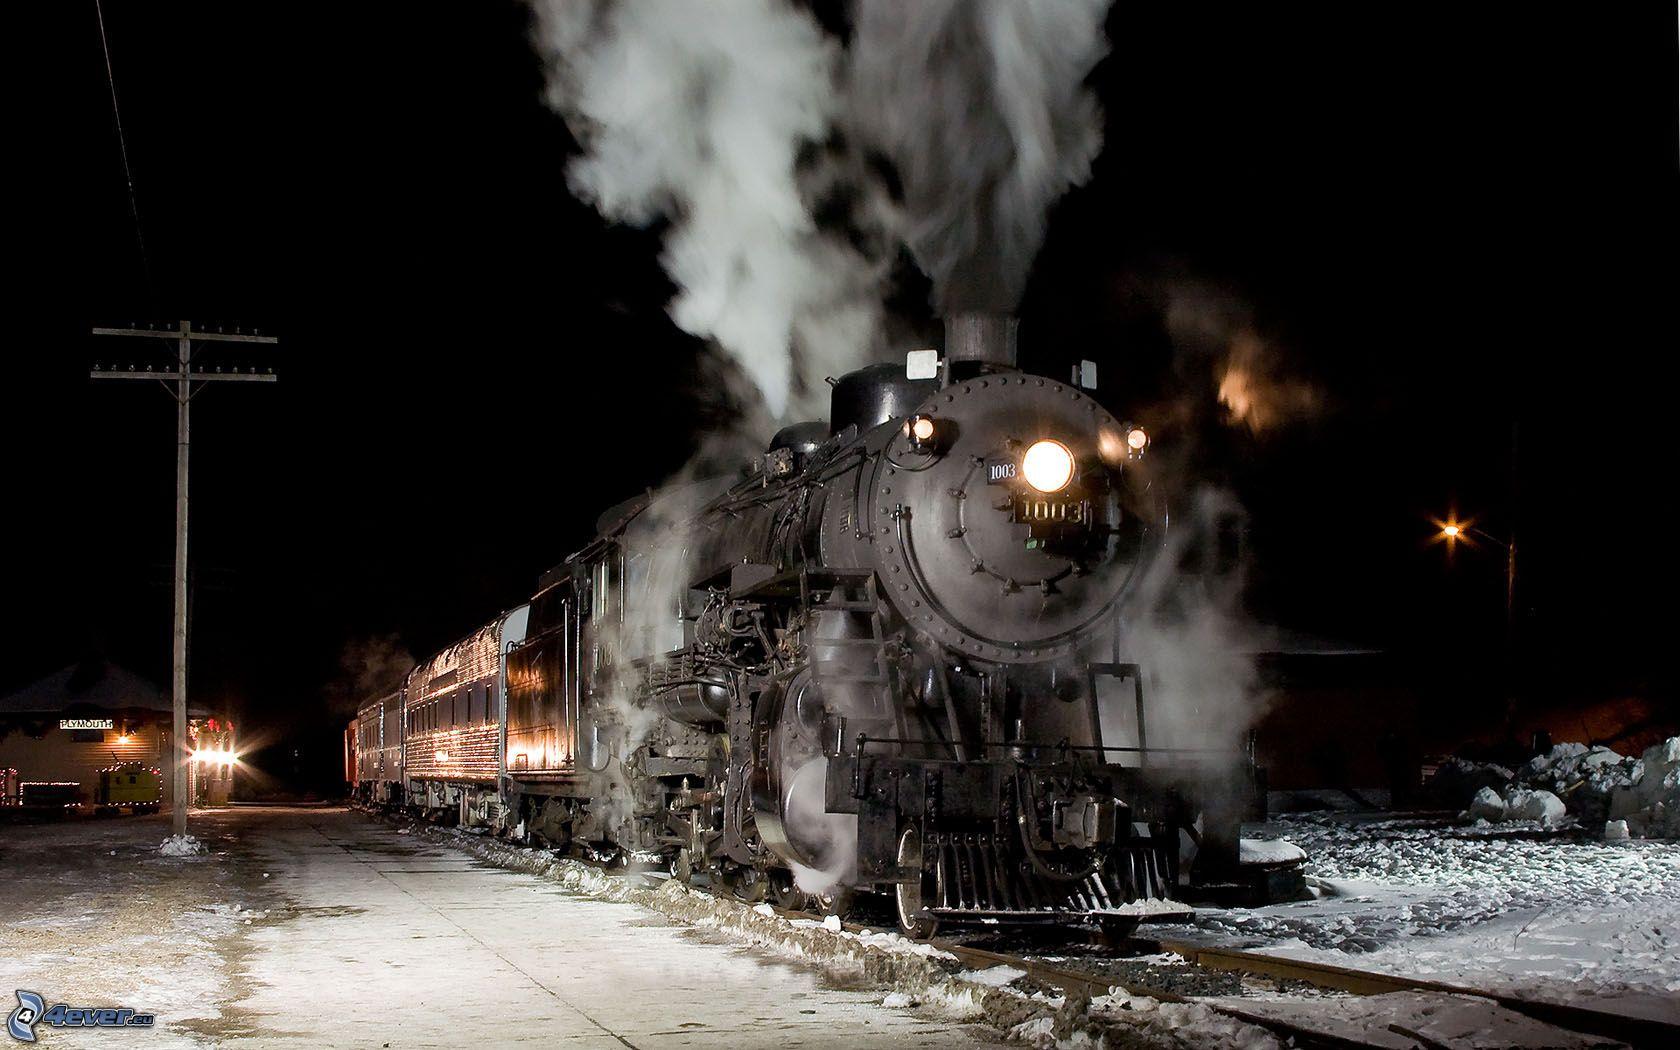 steam locomotive hd wallpapers - photo #32